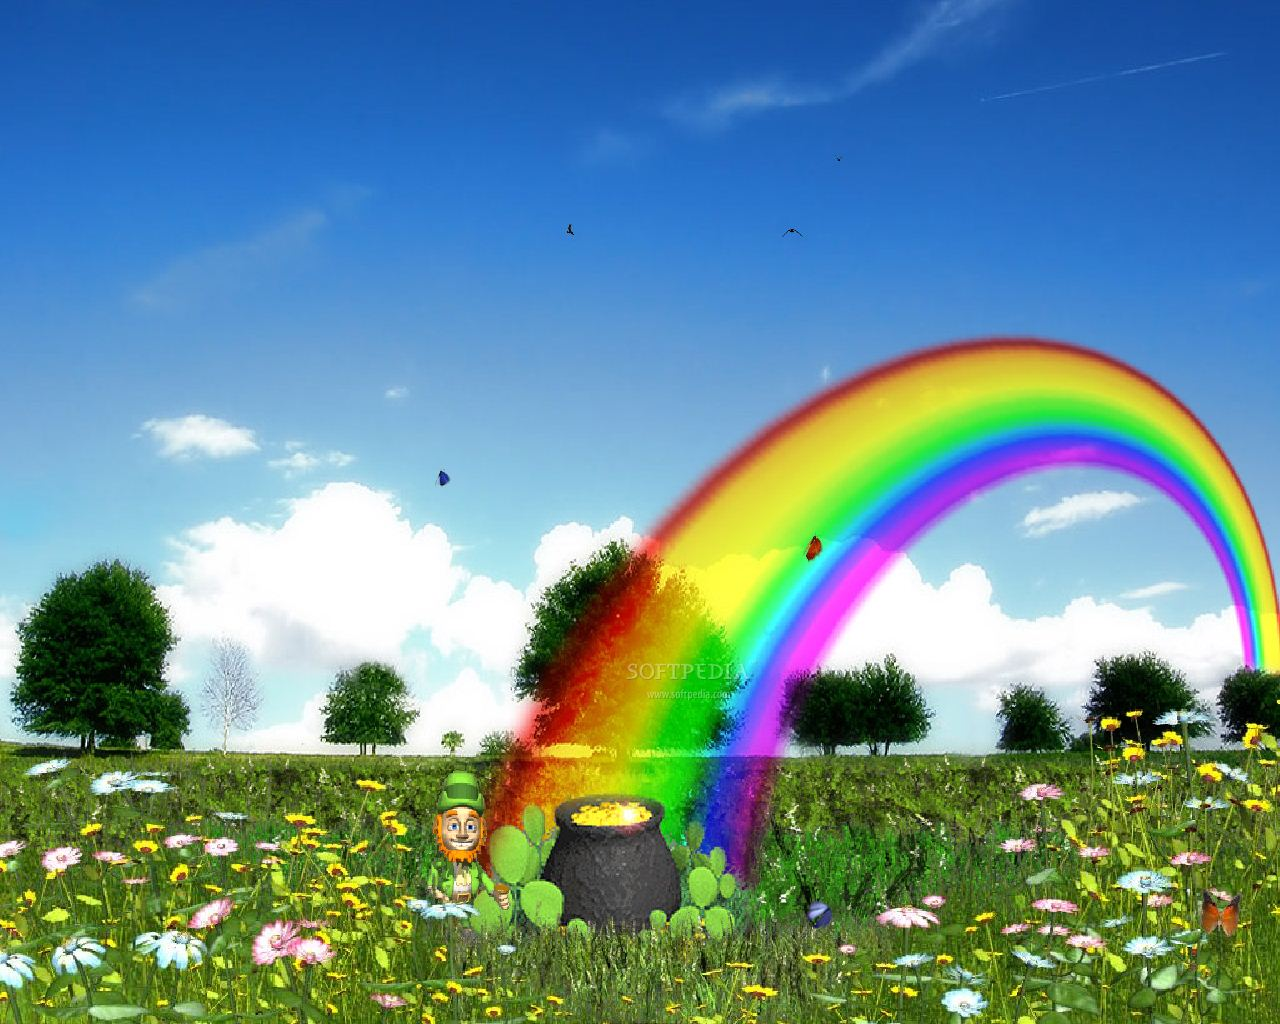 http://3.bp.blogspot.com/_vzcN_7MTUlY/THbfiJxCqcI/AAAAAAAAFv8/f98Y2FtgJEs/s1600/Irish-Spring-Animated-Wallpaper_1.jpg